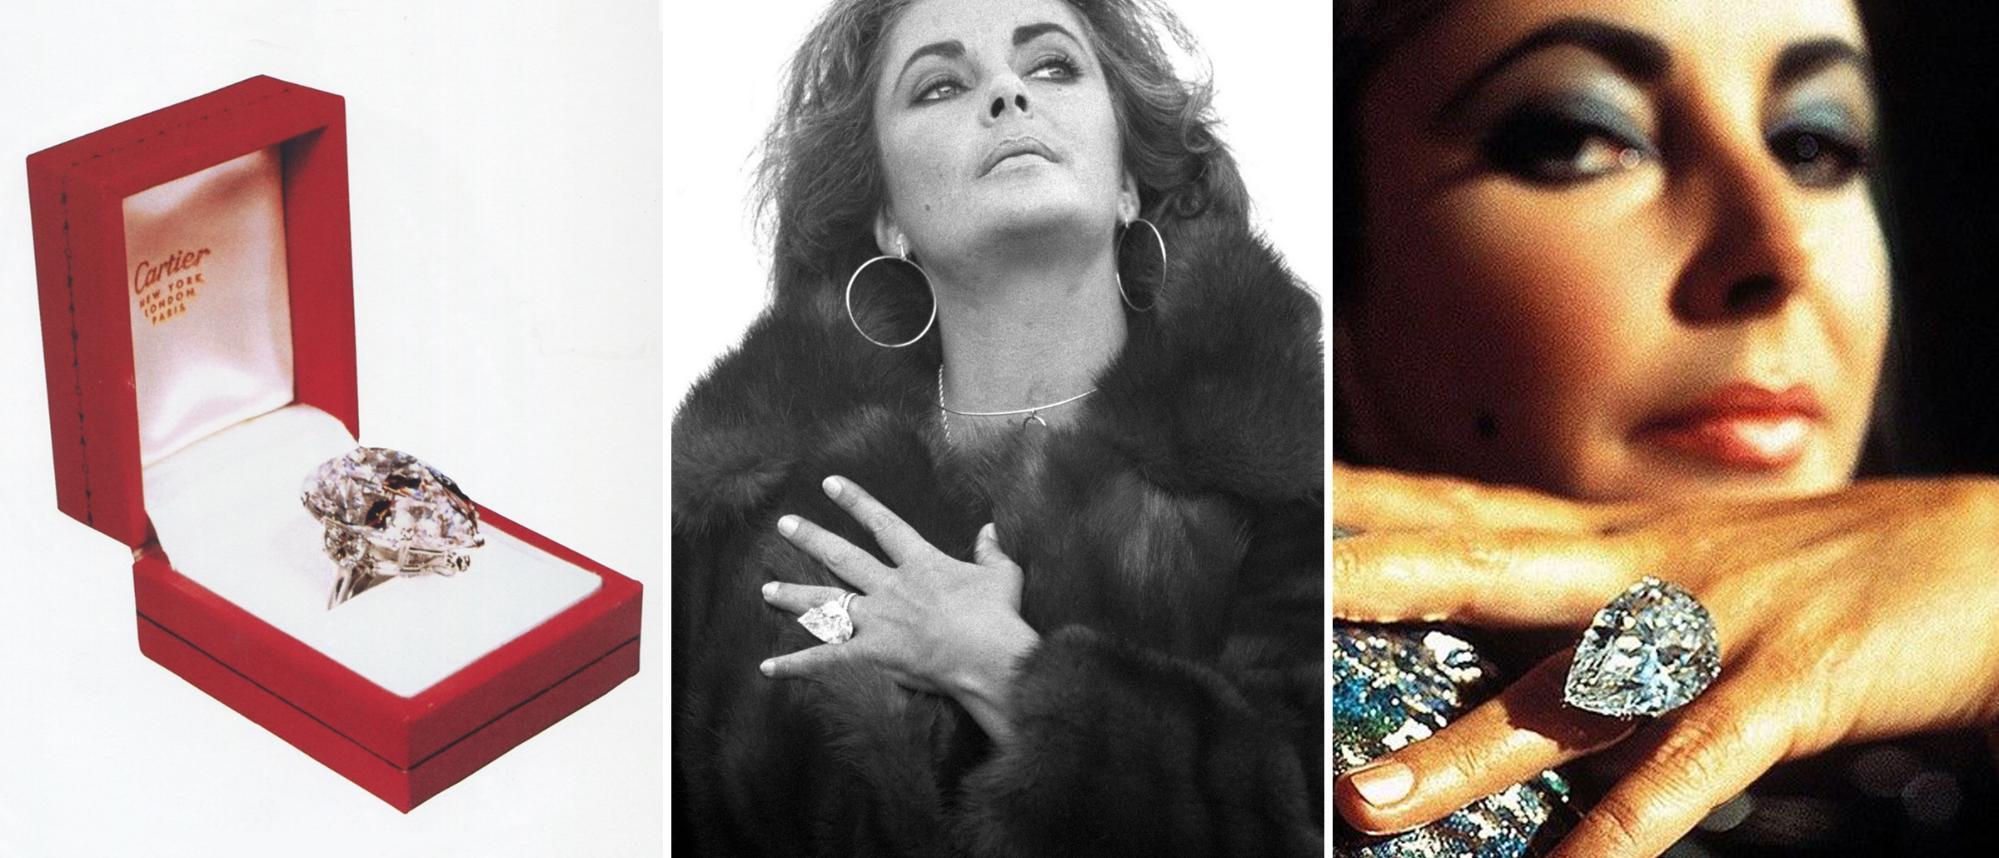 68-carat pear-shaped diamond Liz Taylor Burton